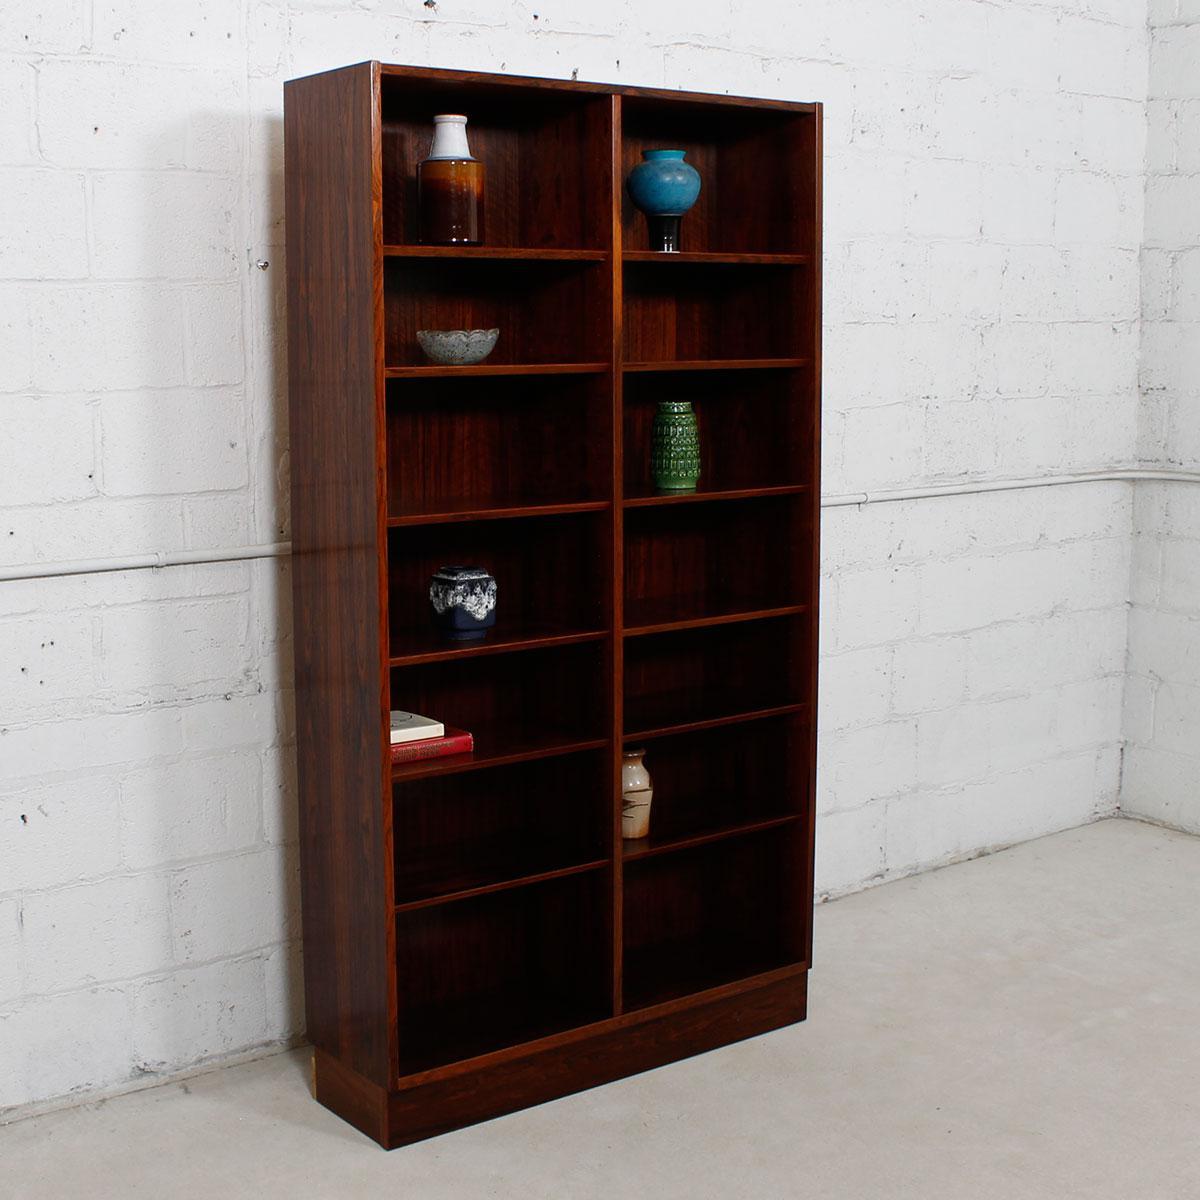 Rosewood Danish Modern Rosewood Adjustable Shelves Bookcase For Sale    Image 7 Of 7